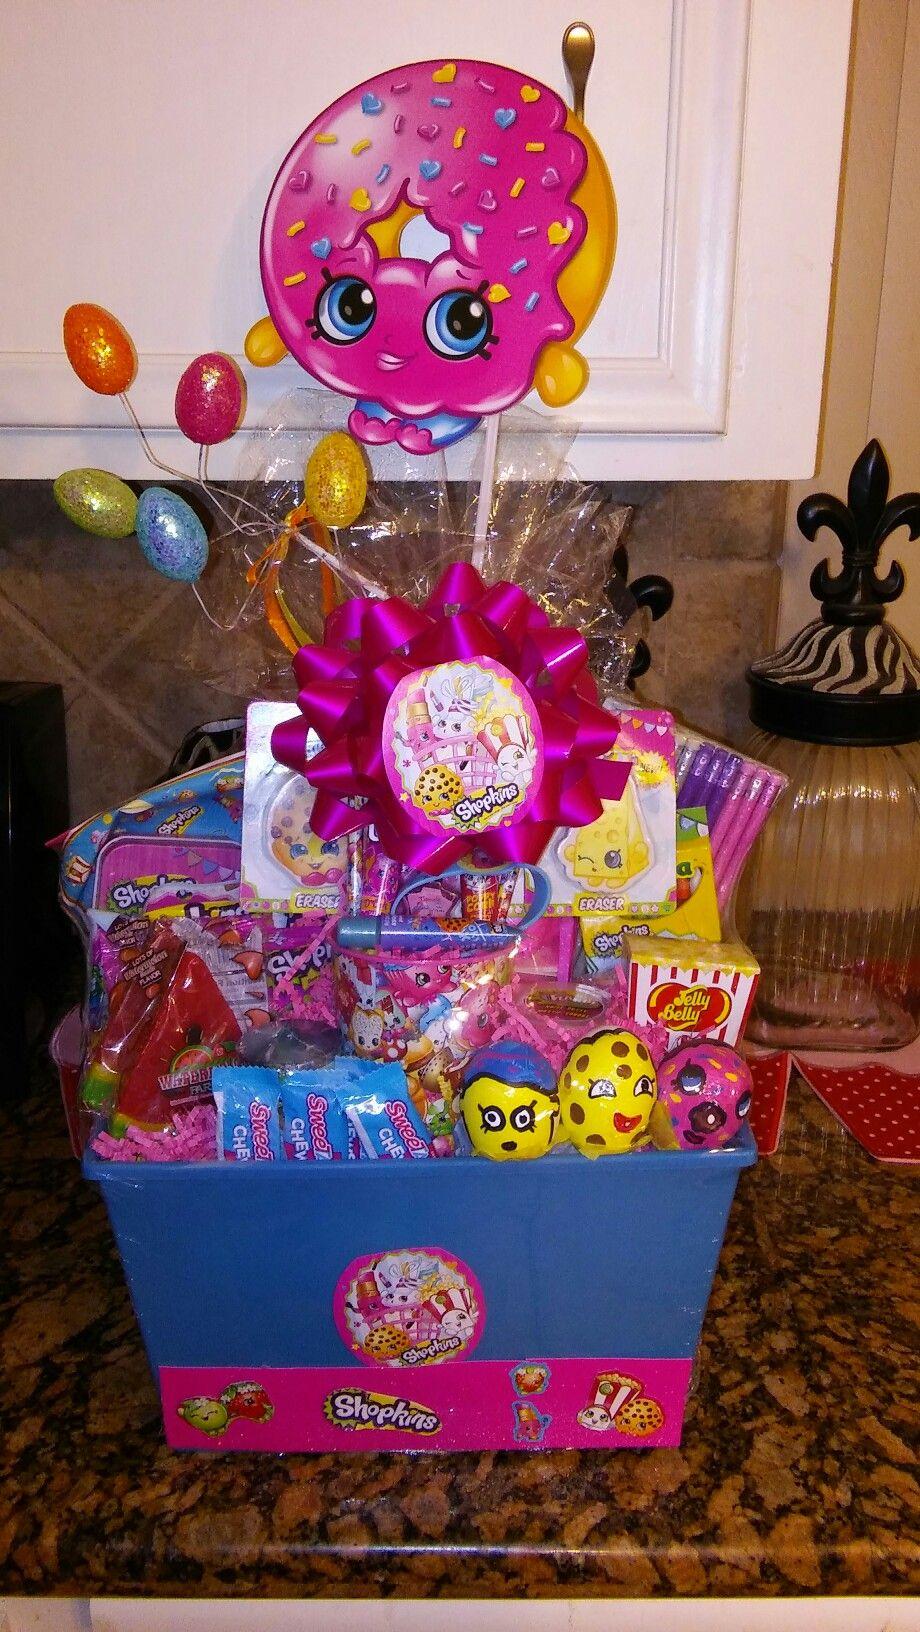 Shopkins easter basket gift baskets pinterest easter baskets shopkins easter basket negle Image collections